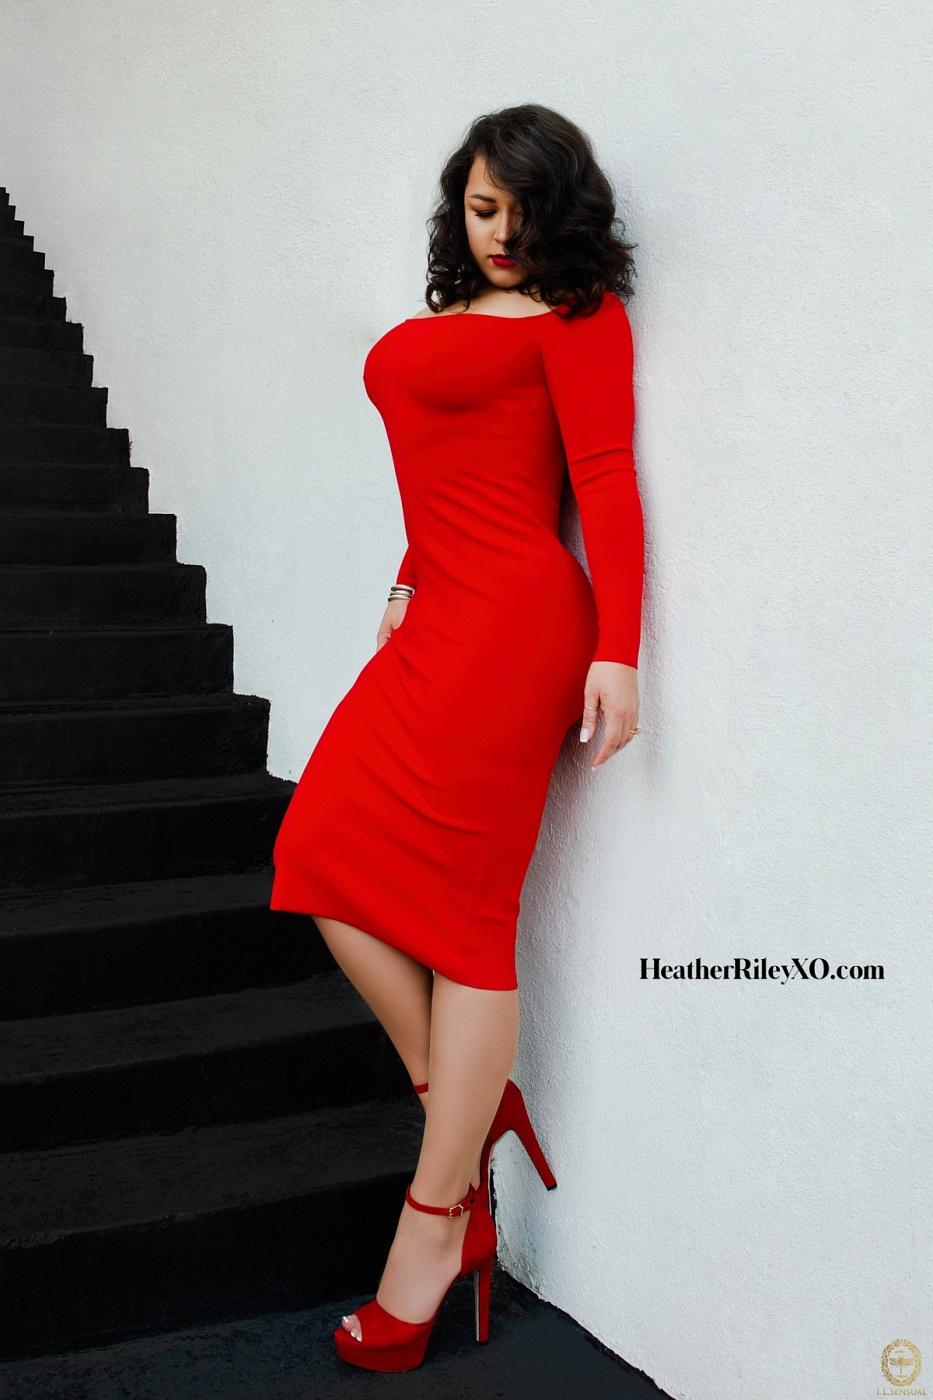 Heather Riley